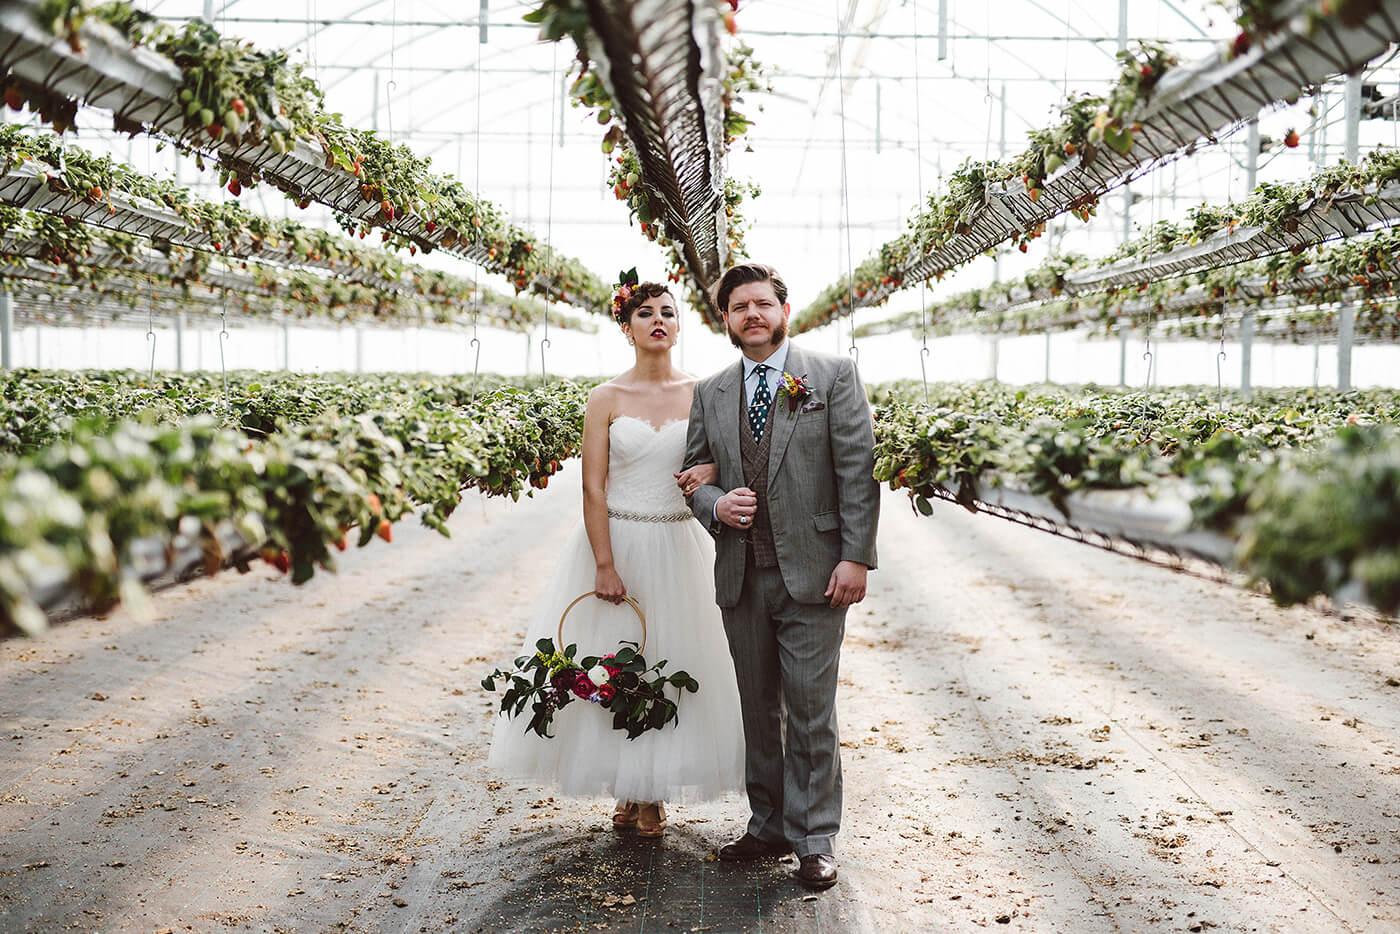 roma-organizacao-eventos-editorial-mid-century-modern-wedding-in-a-strawberry-field-14